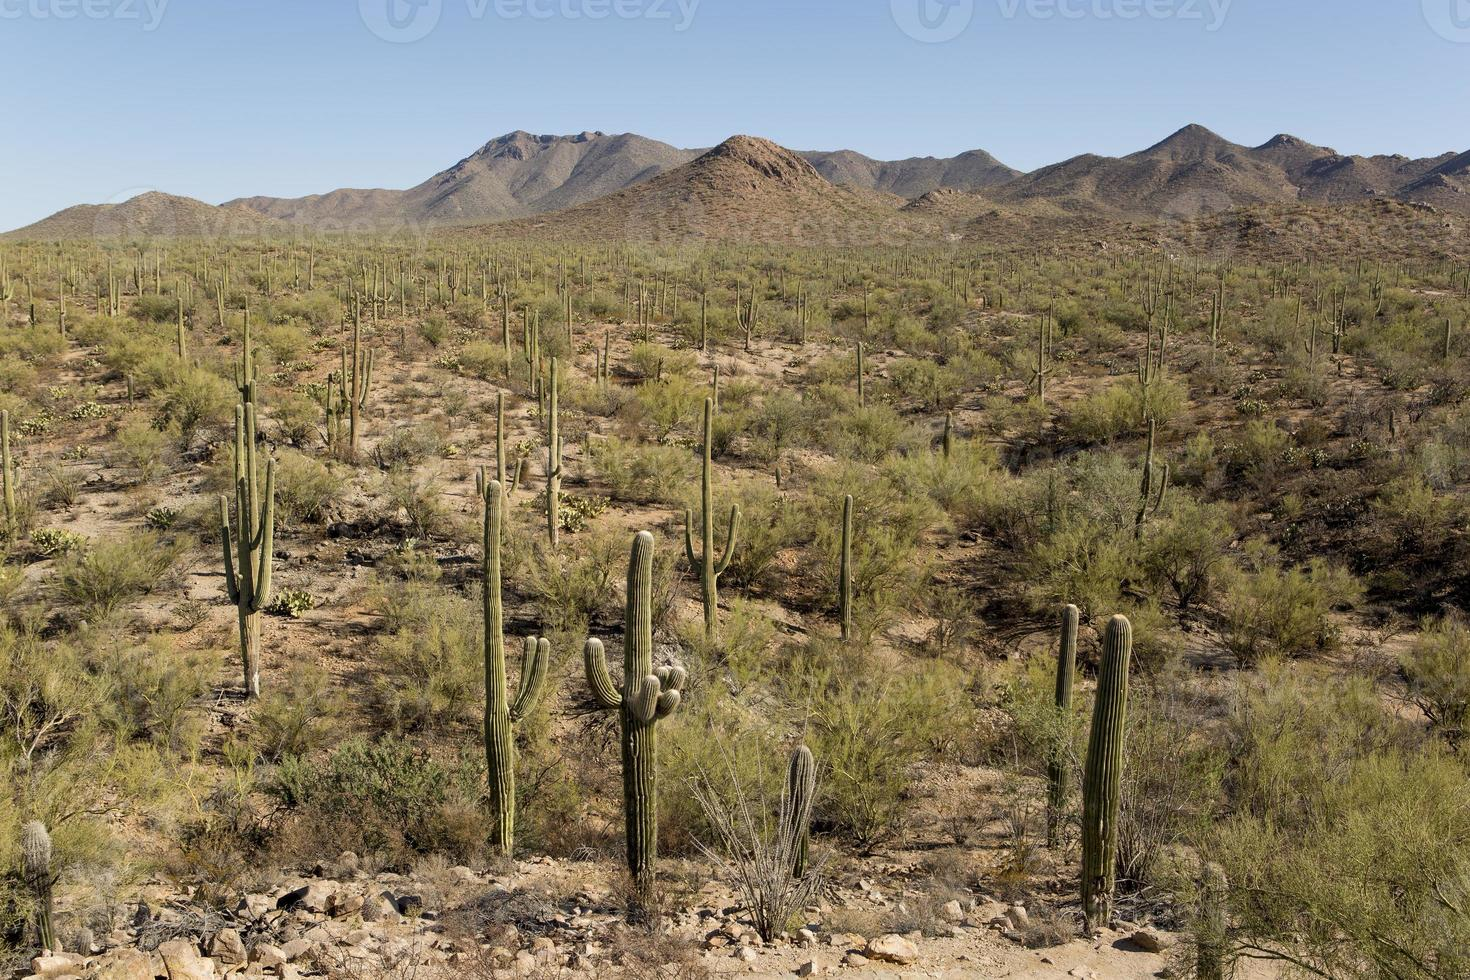 deserto con cactus saguaro foto